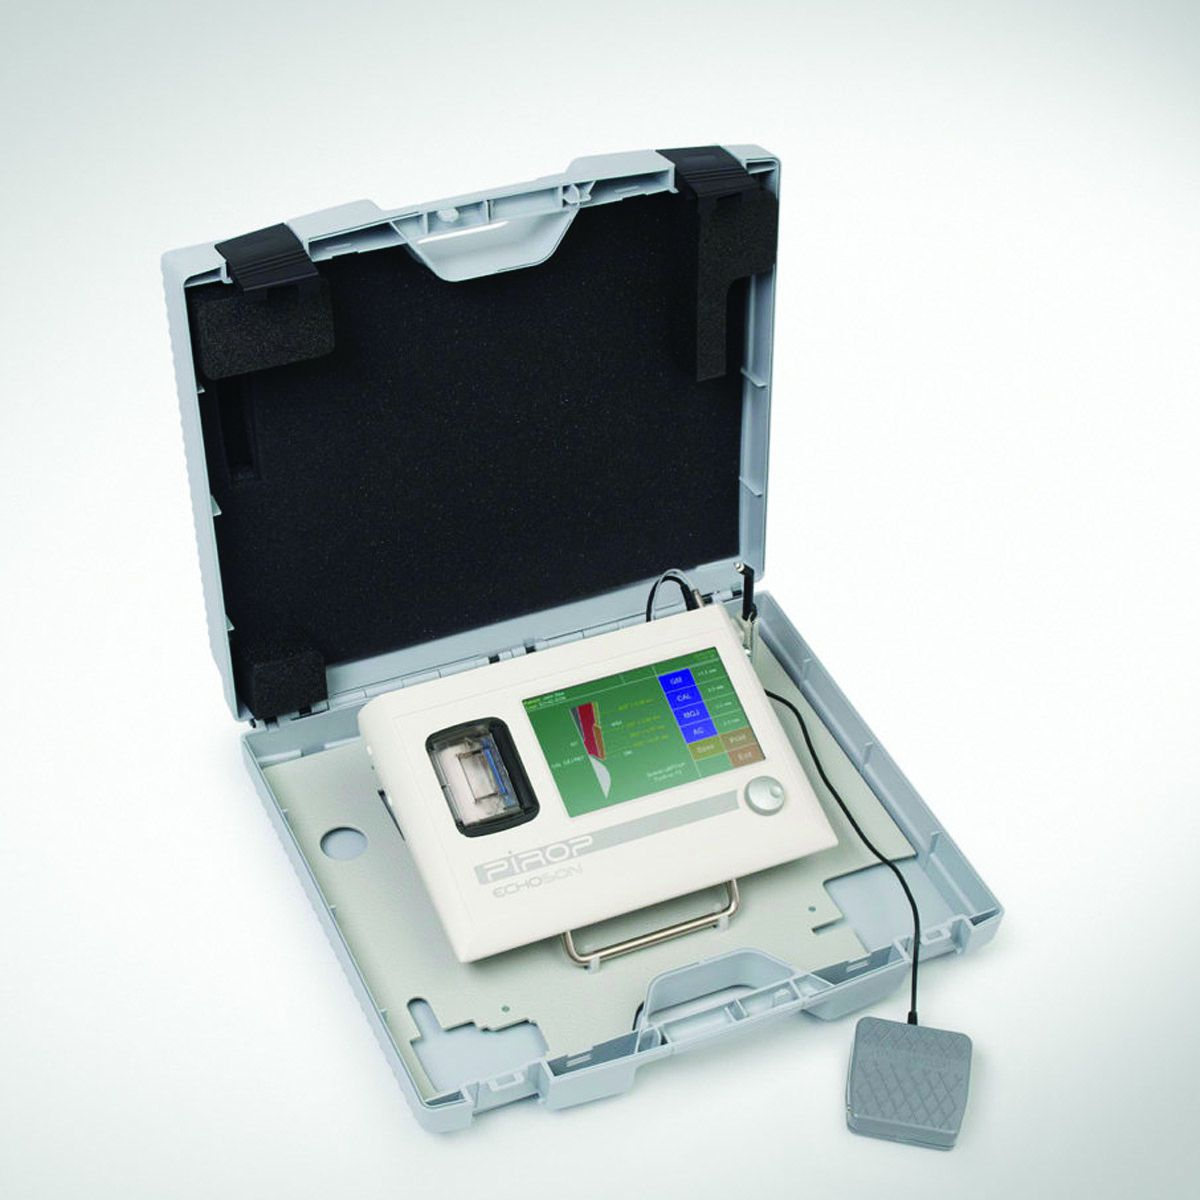 PIROP Biometric scanner